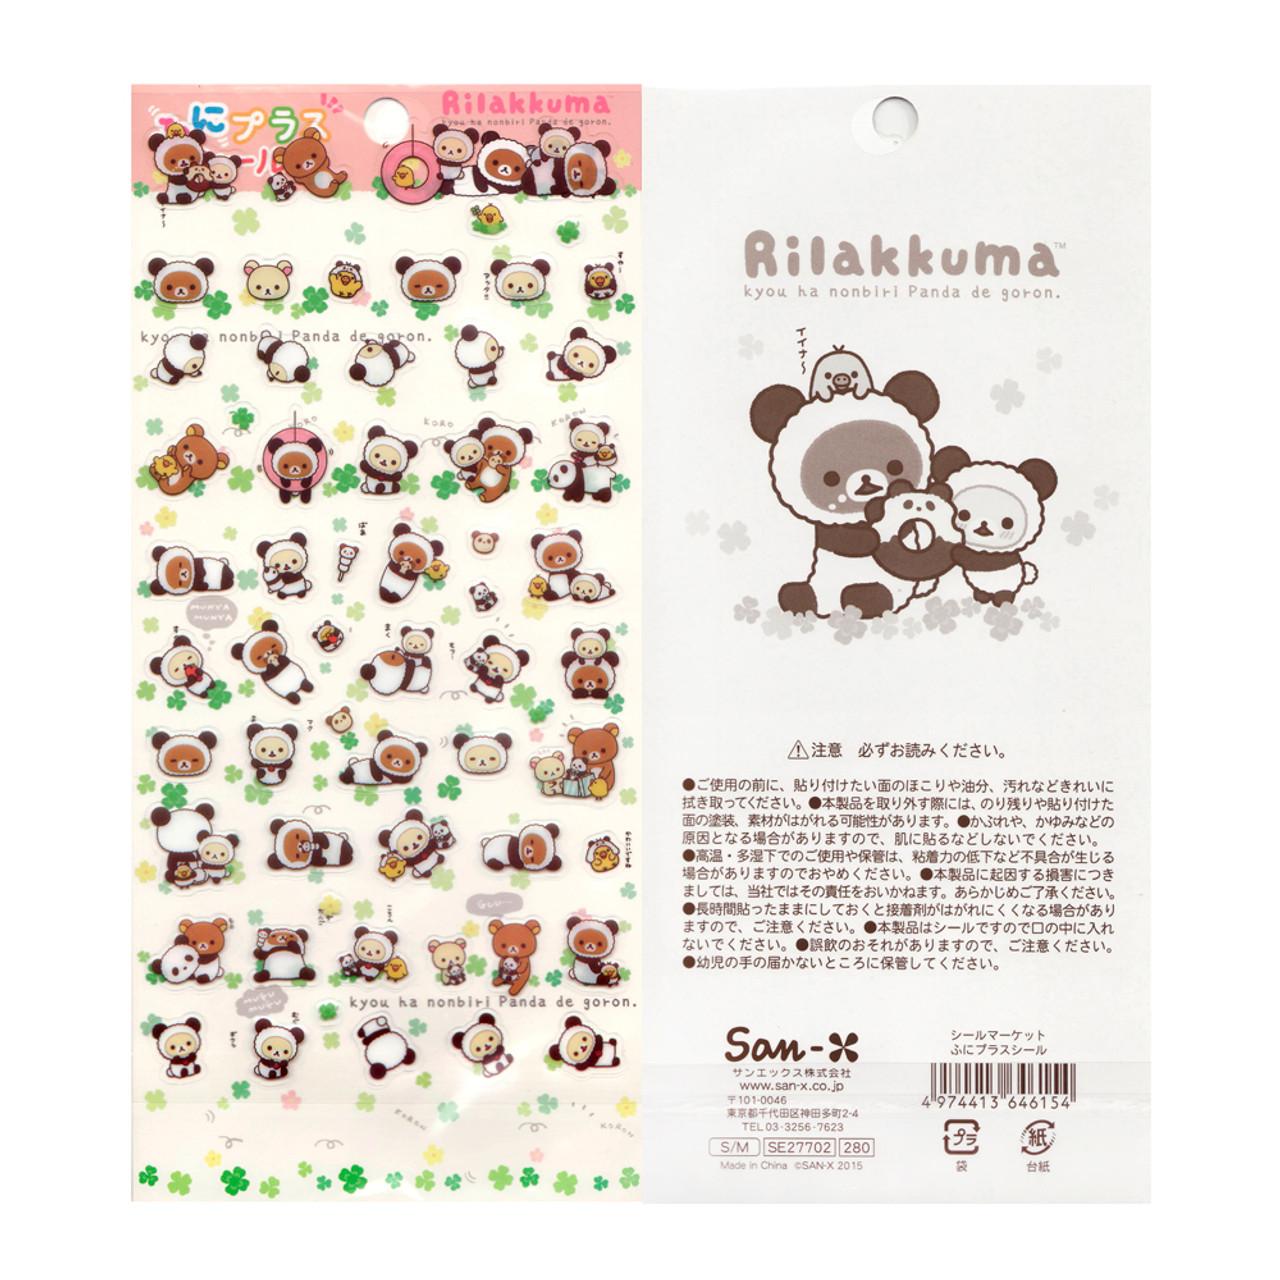 San-x Rilakkuma Relax Bear Panda Costume With Clover Sticker SE27702 ( Back View )